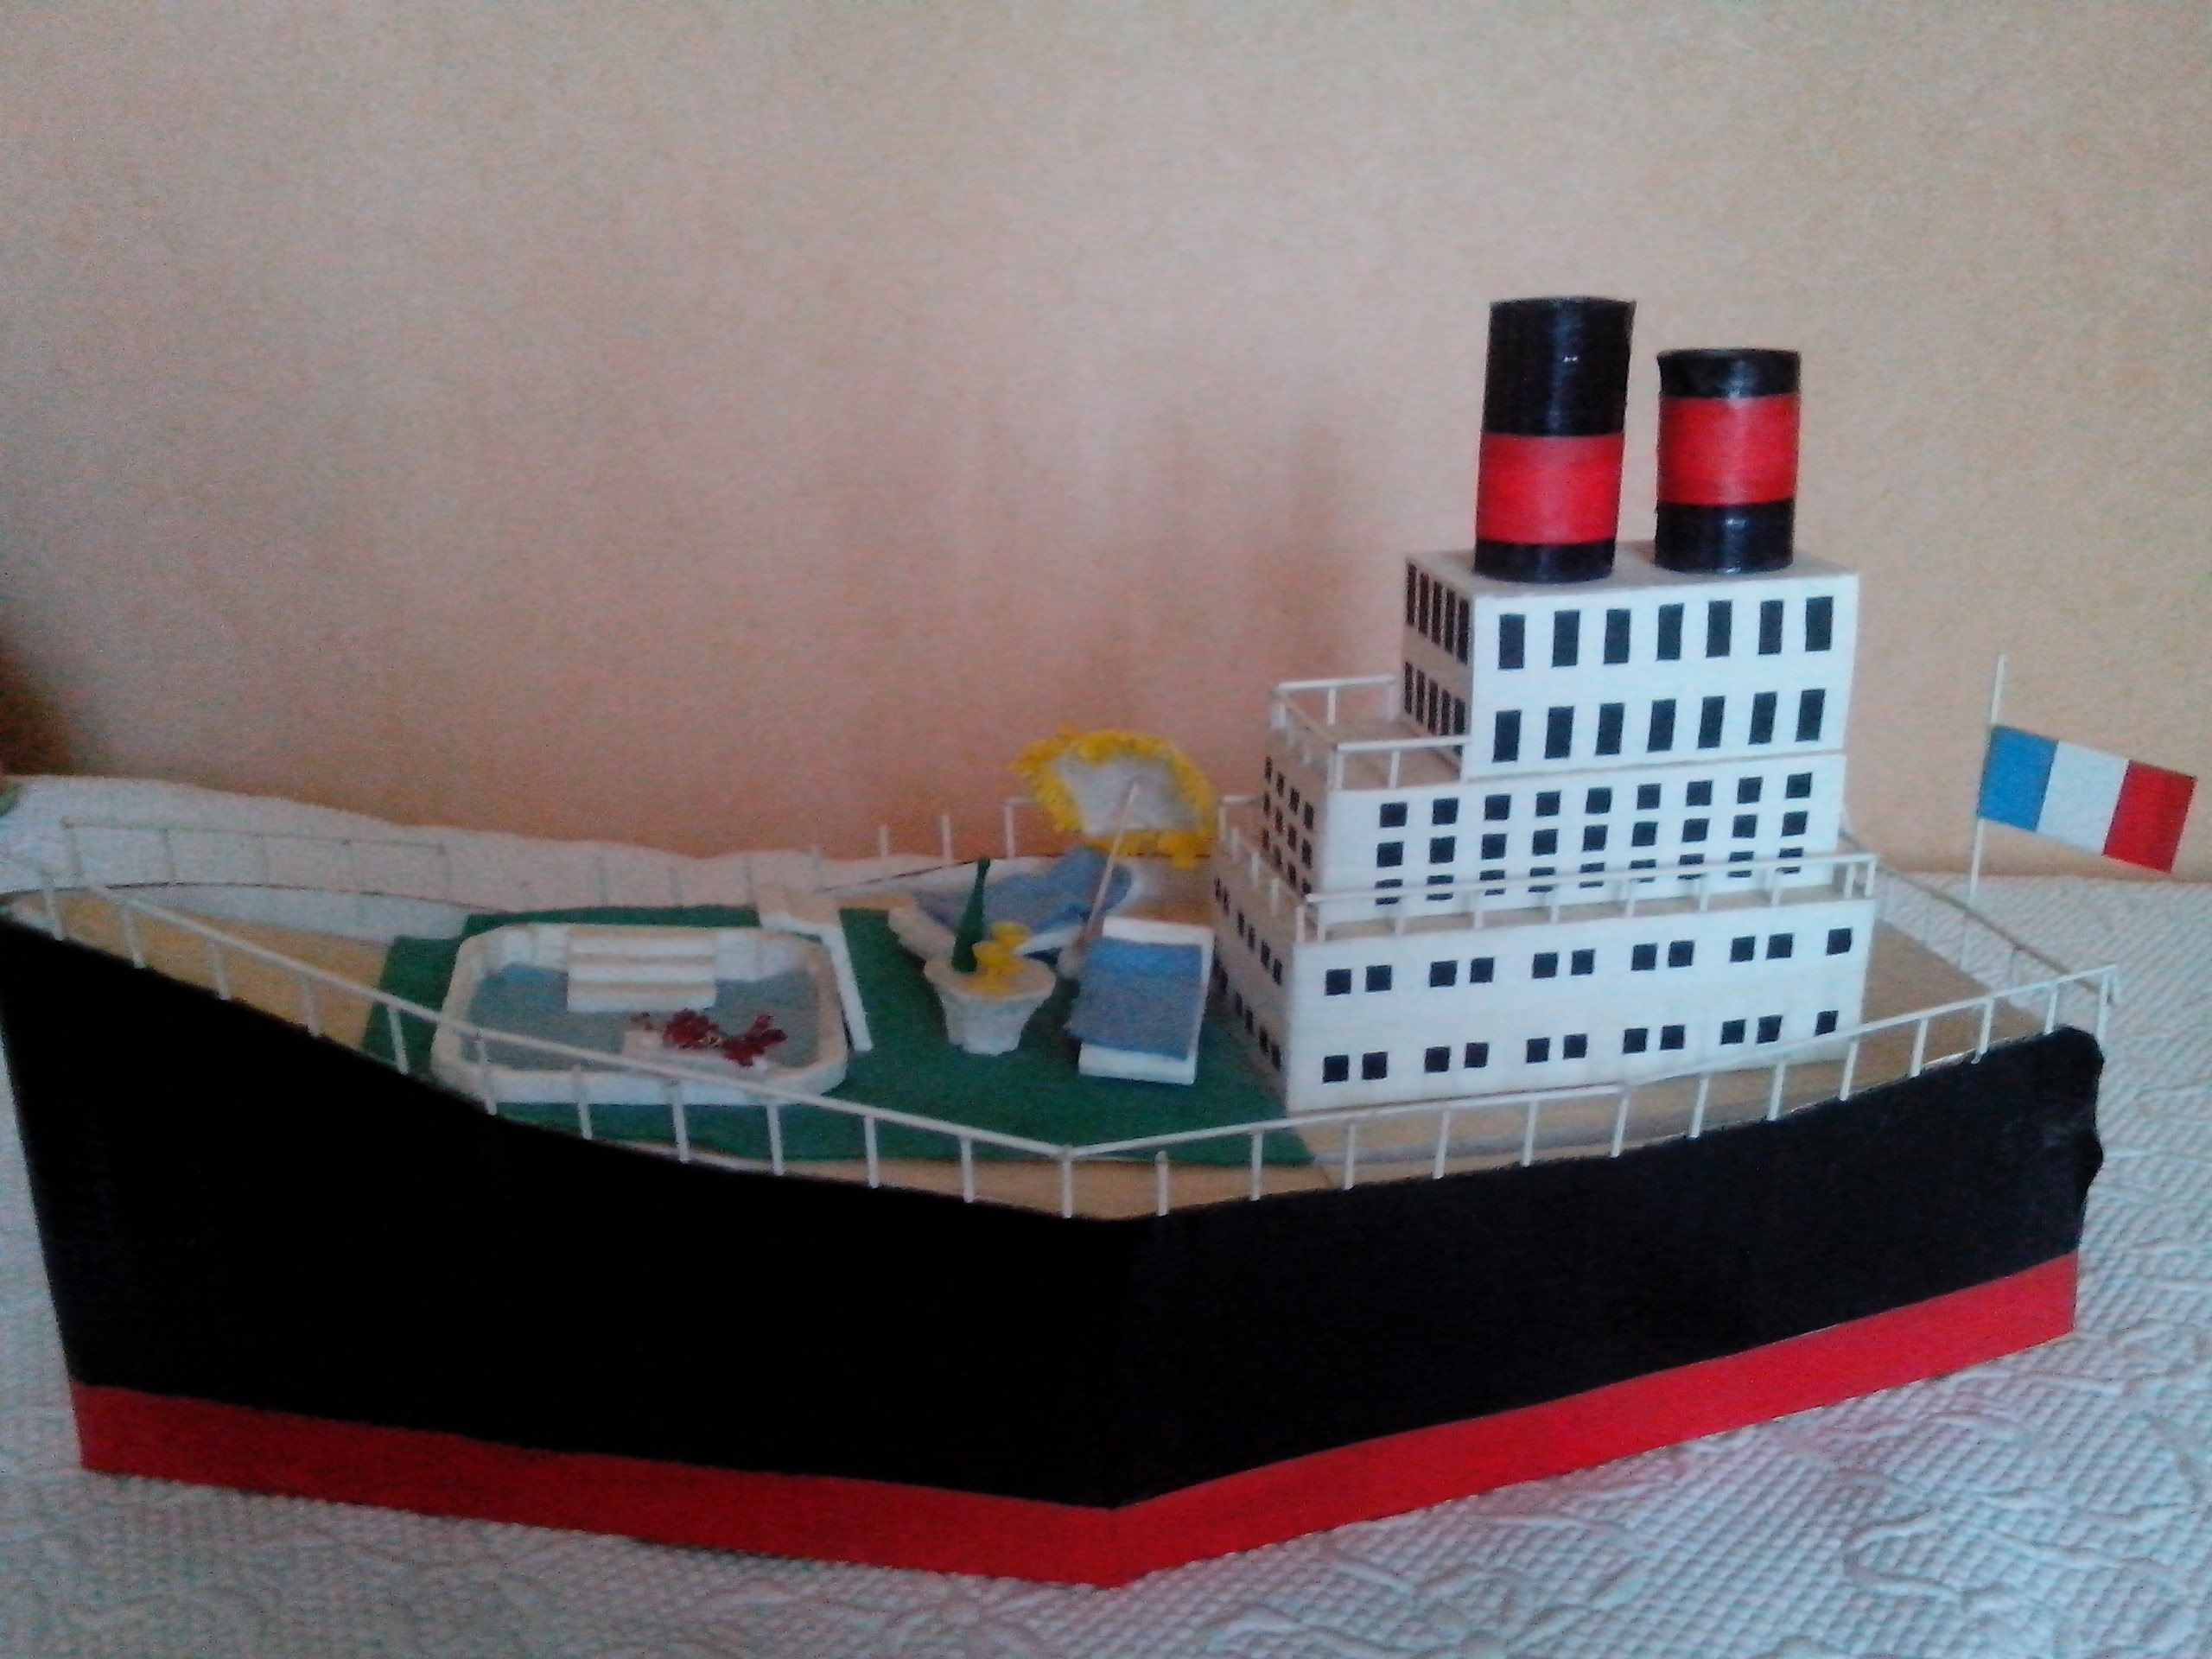 urne en carton repr sentant un bateau de croisi re id ale. Black Bedroom Furniture Sets. Home Design Ideas